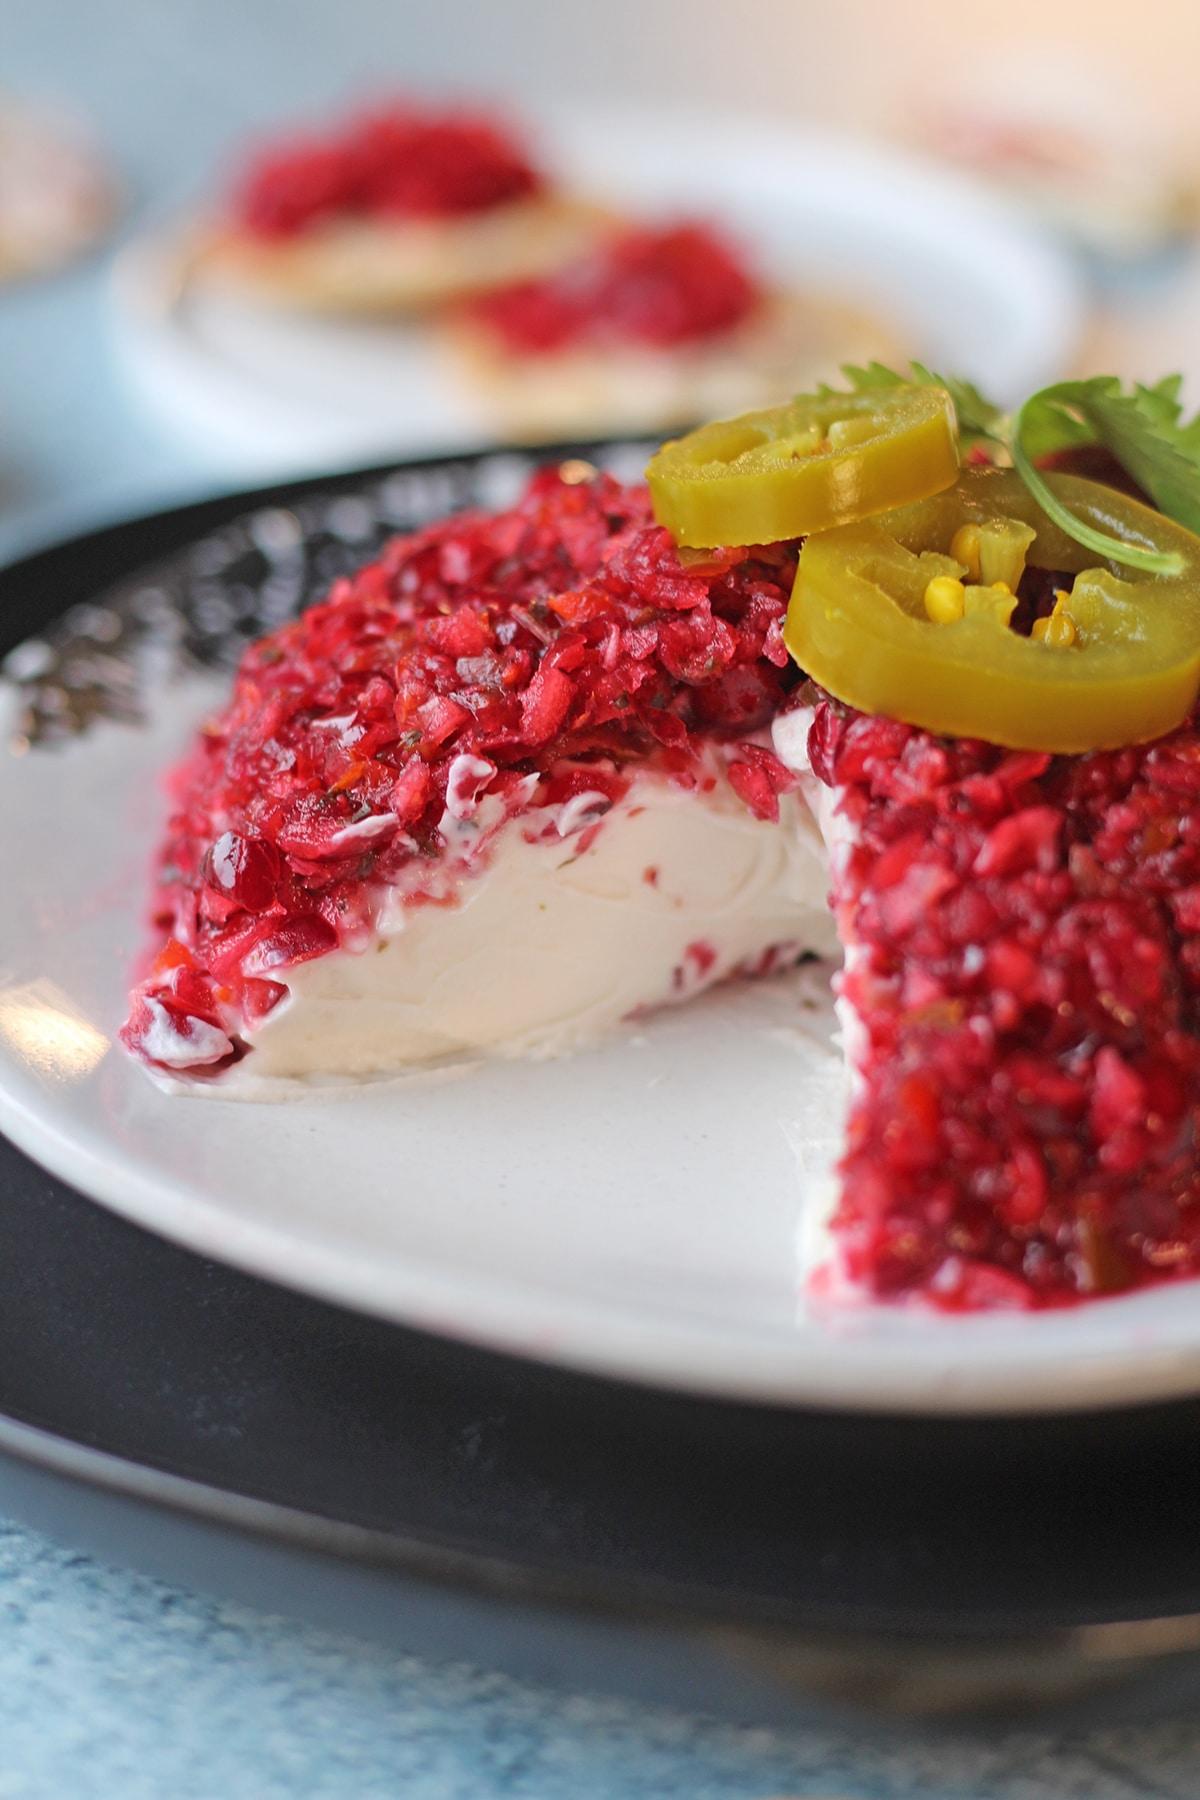 Cranberry salsa over vegan cream cheese on plate.